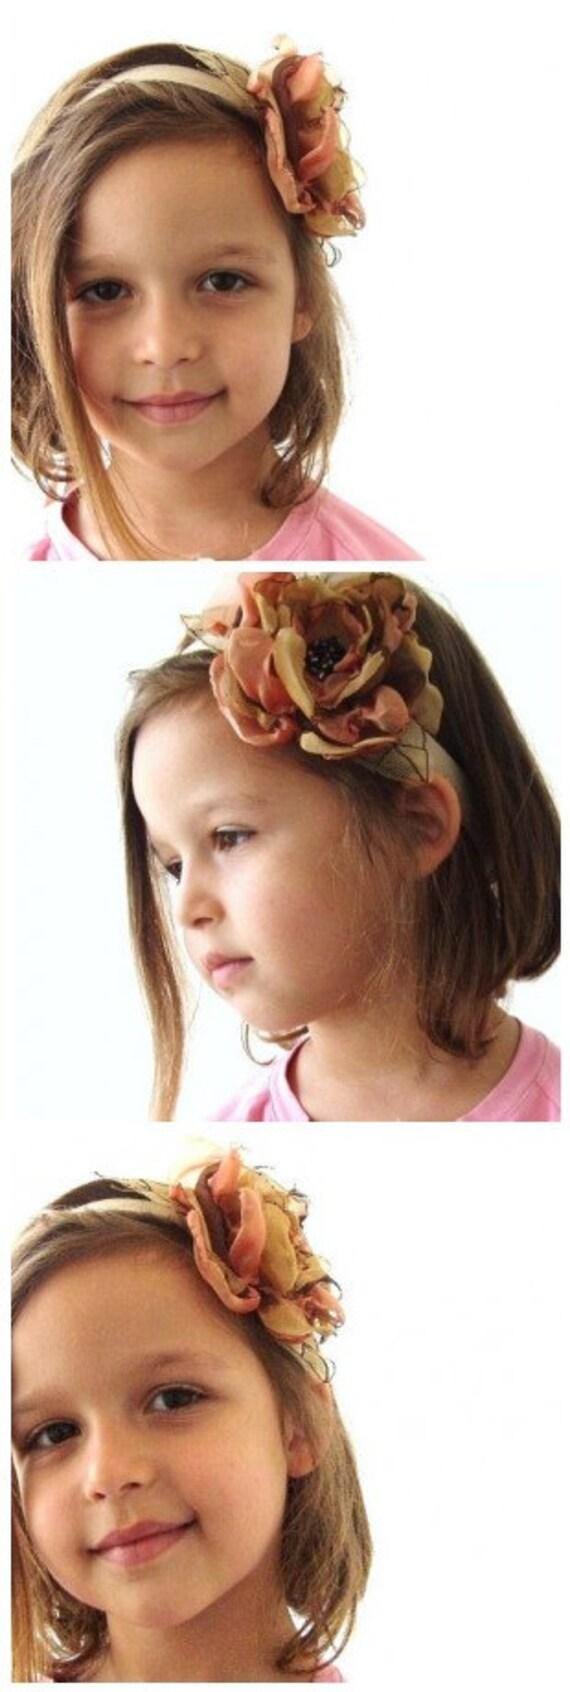 Caramel Orange Mix Organza Flower Headband Mother Daughter Hair Accessory Sash Corsage  OOAK Fall Wedding